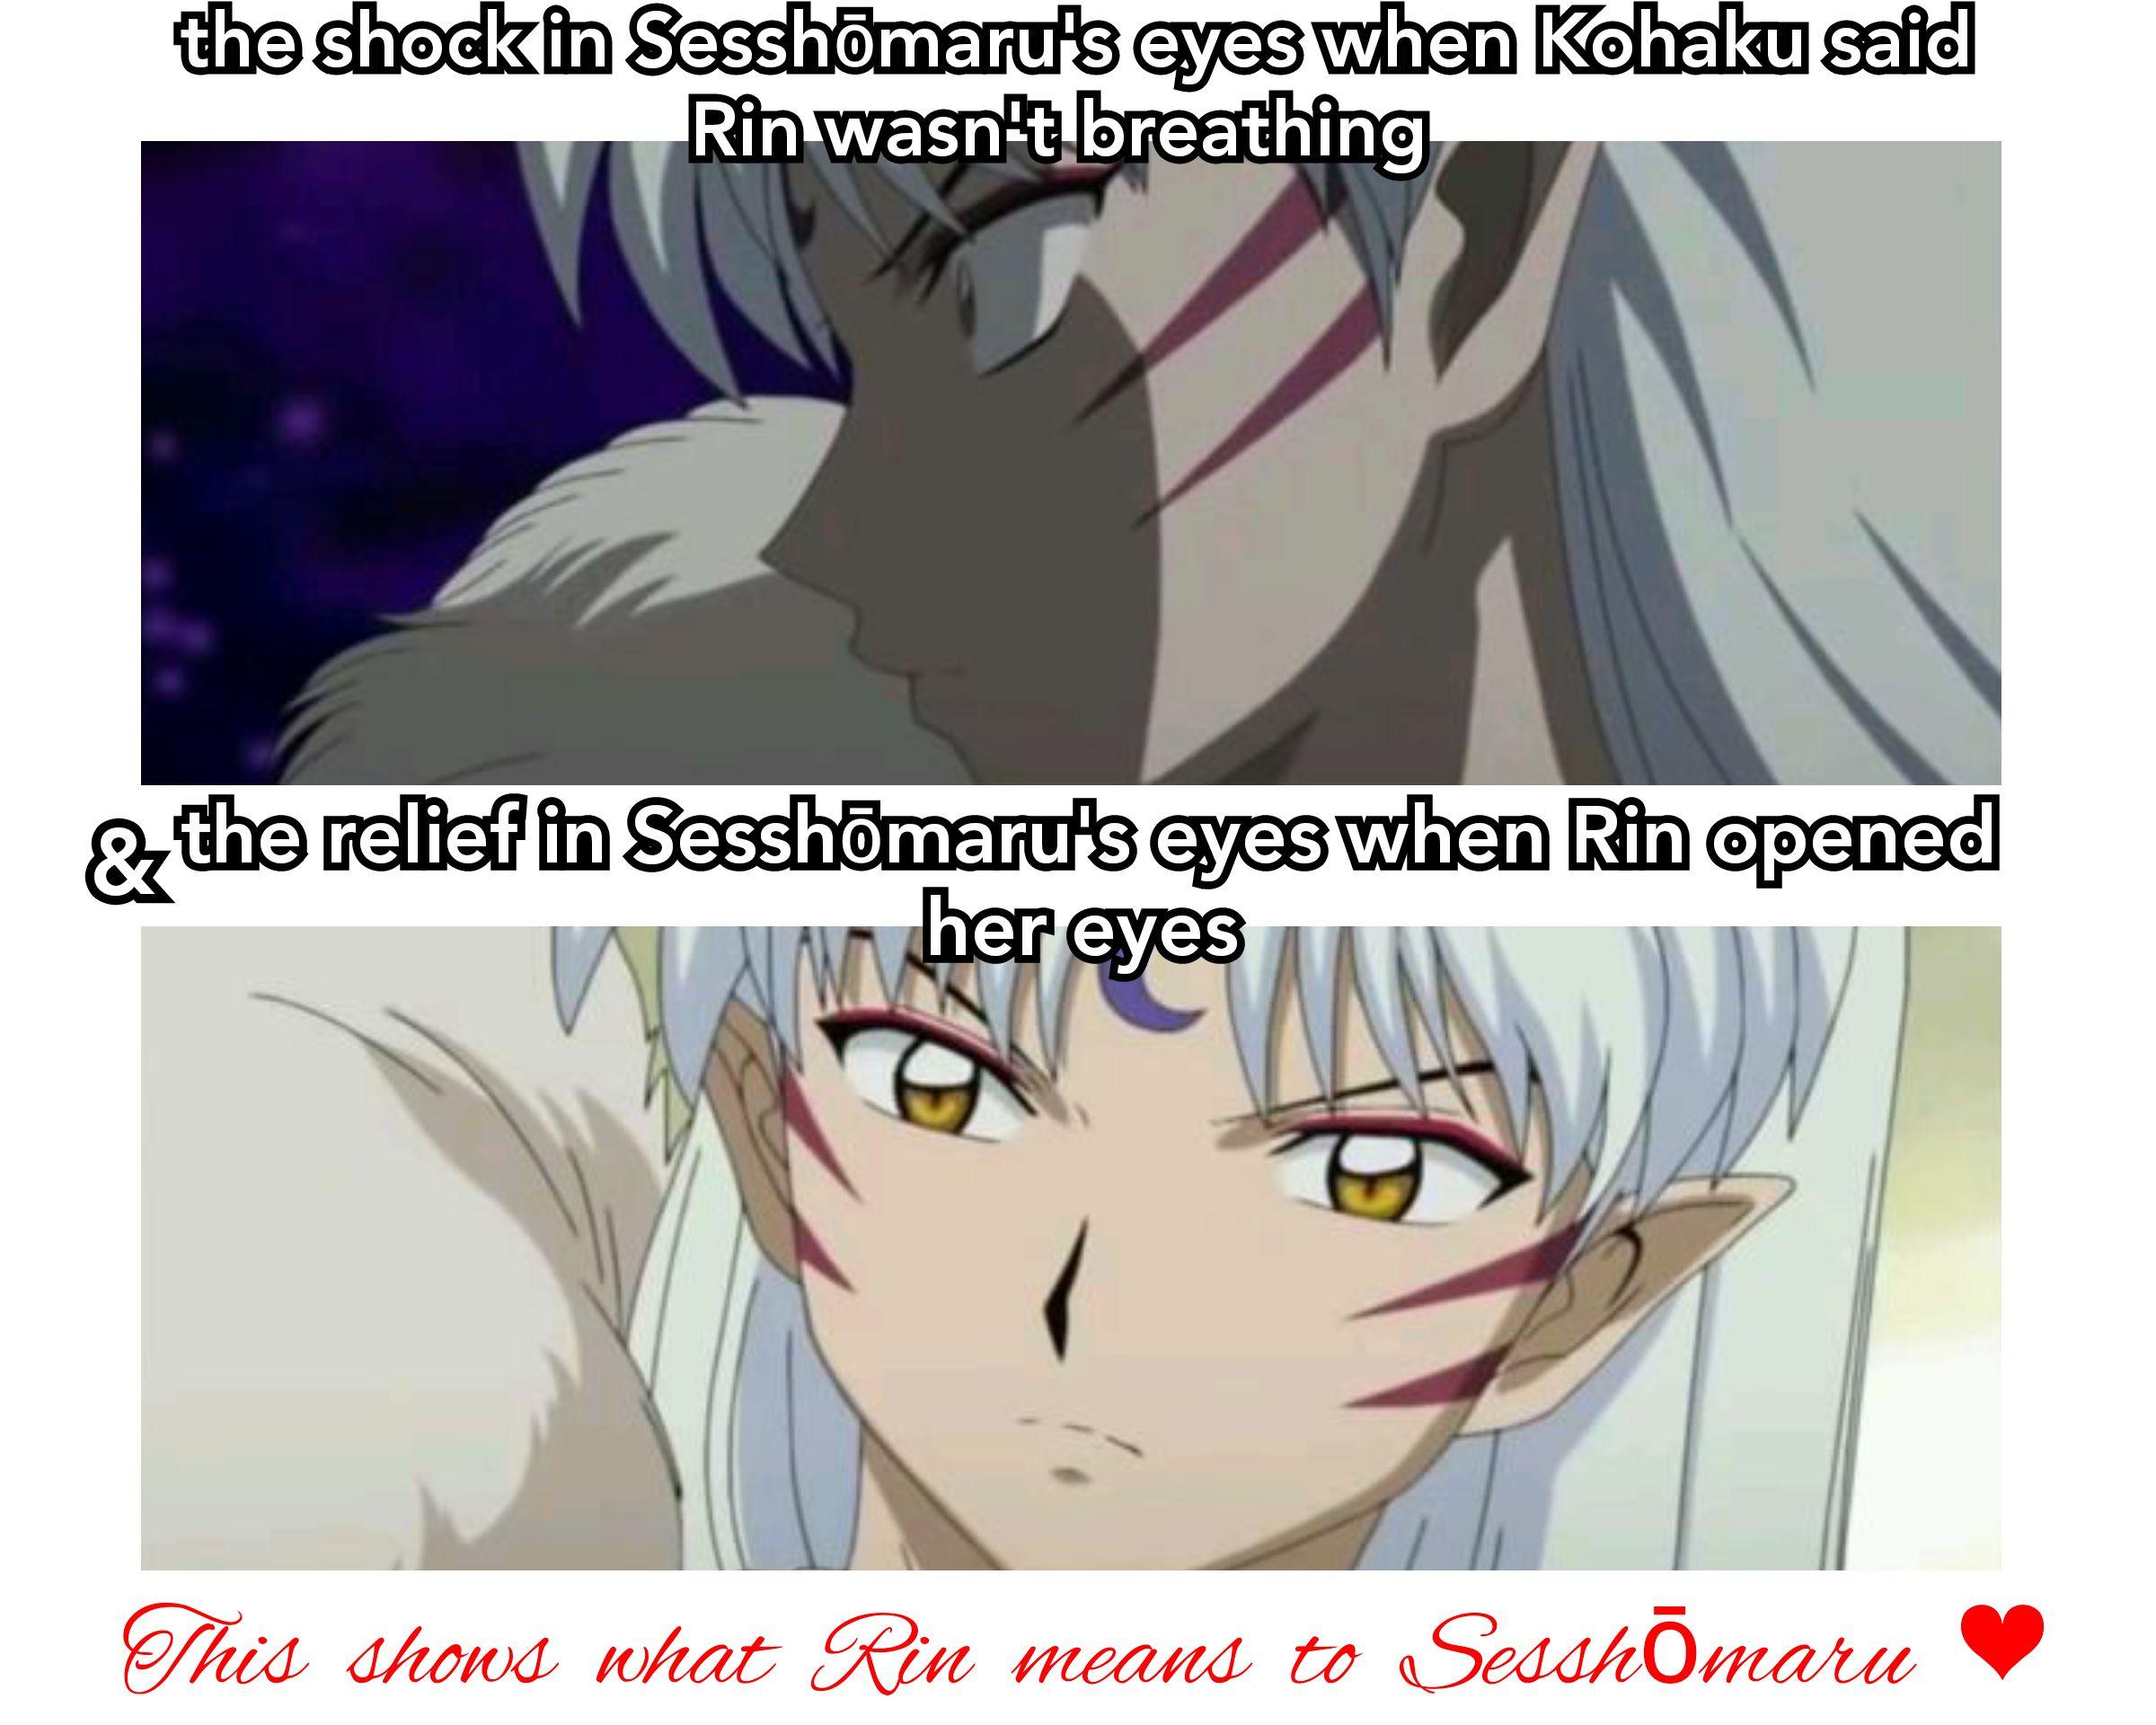 thefinalact episode09 SesshōmarRin Sesshomaru, Kohaku